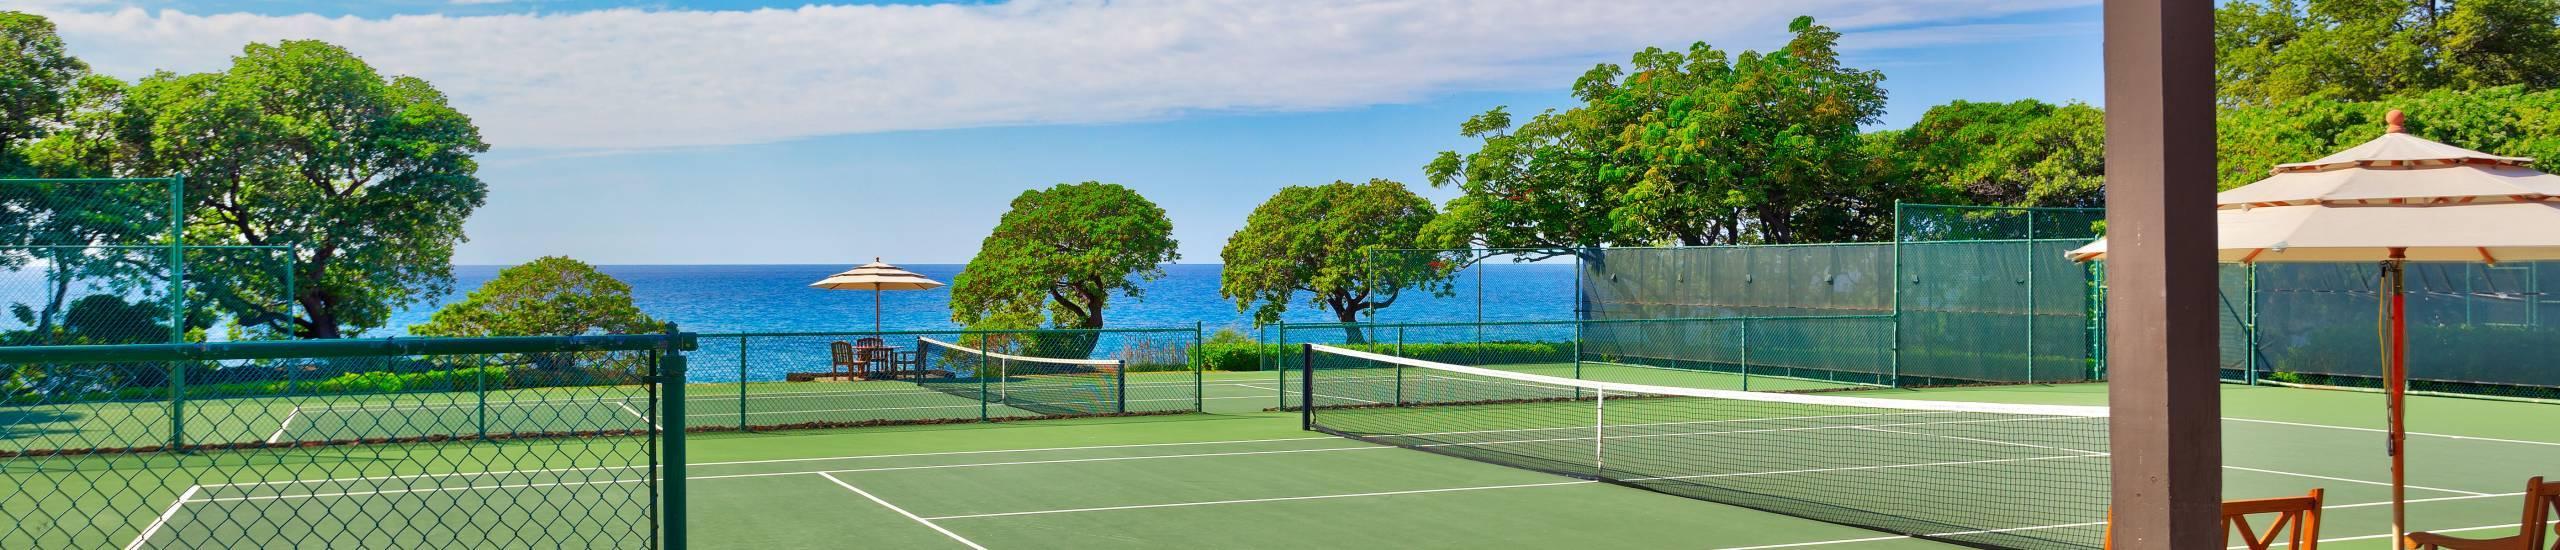 Mauna Kea Resort Tennis Courts with Ocean View